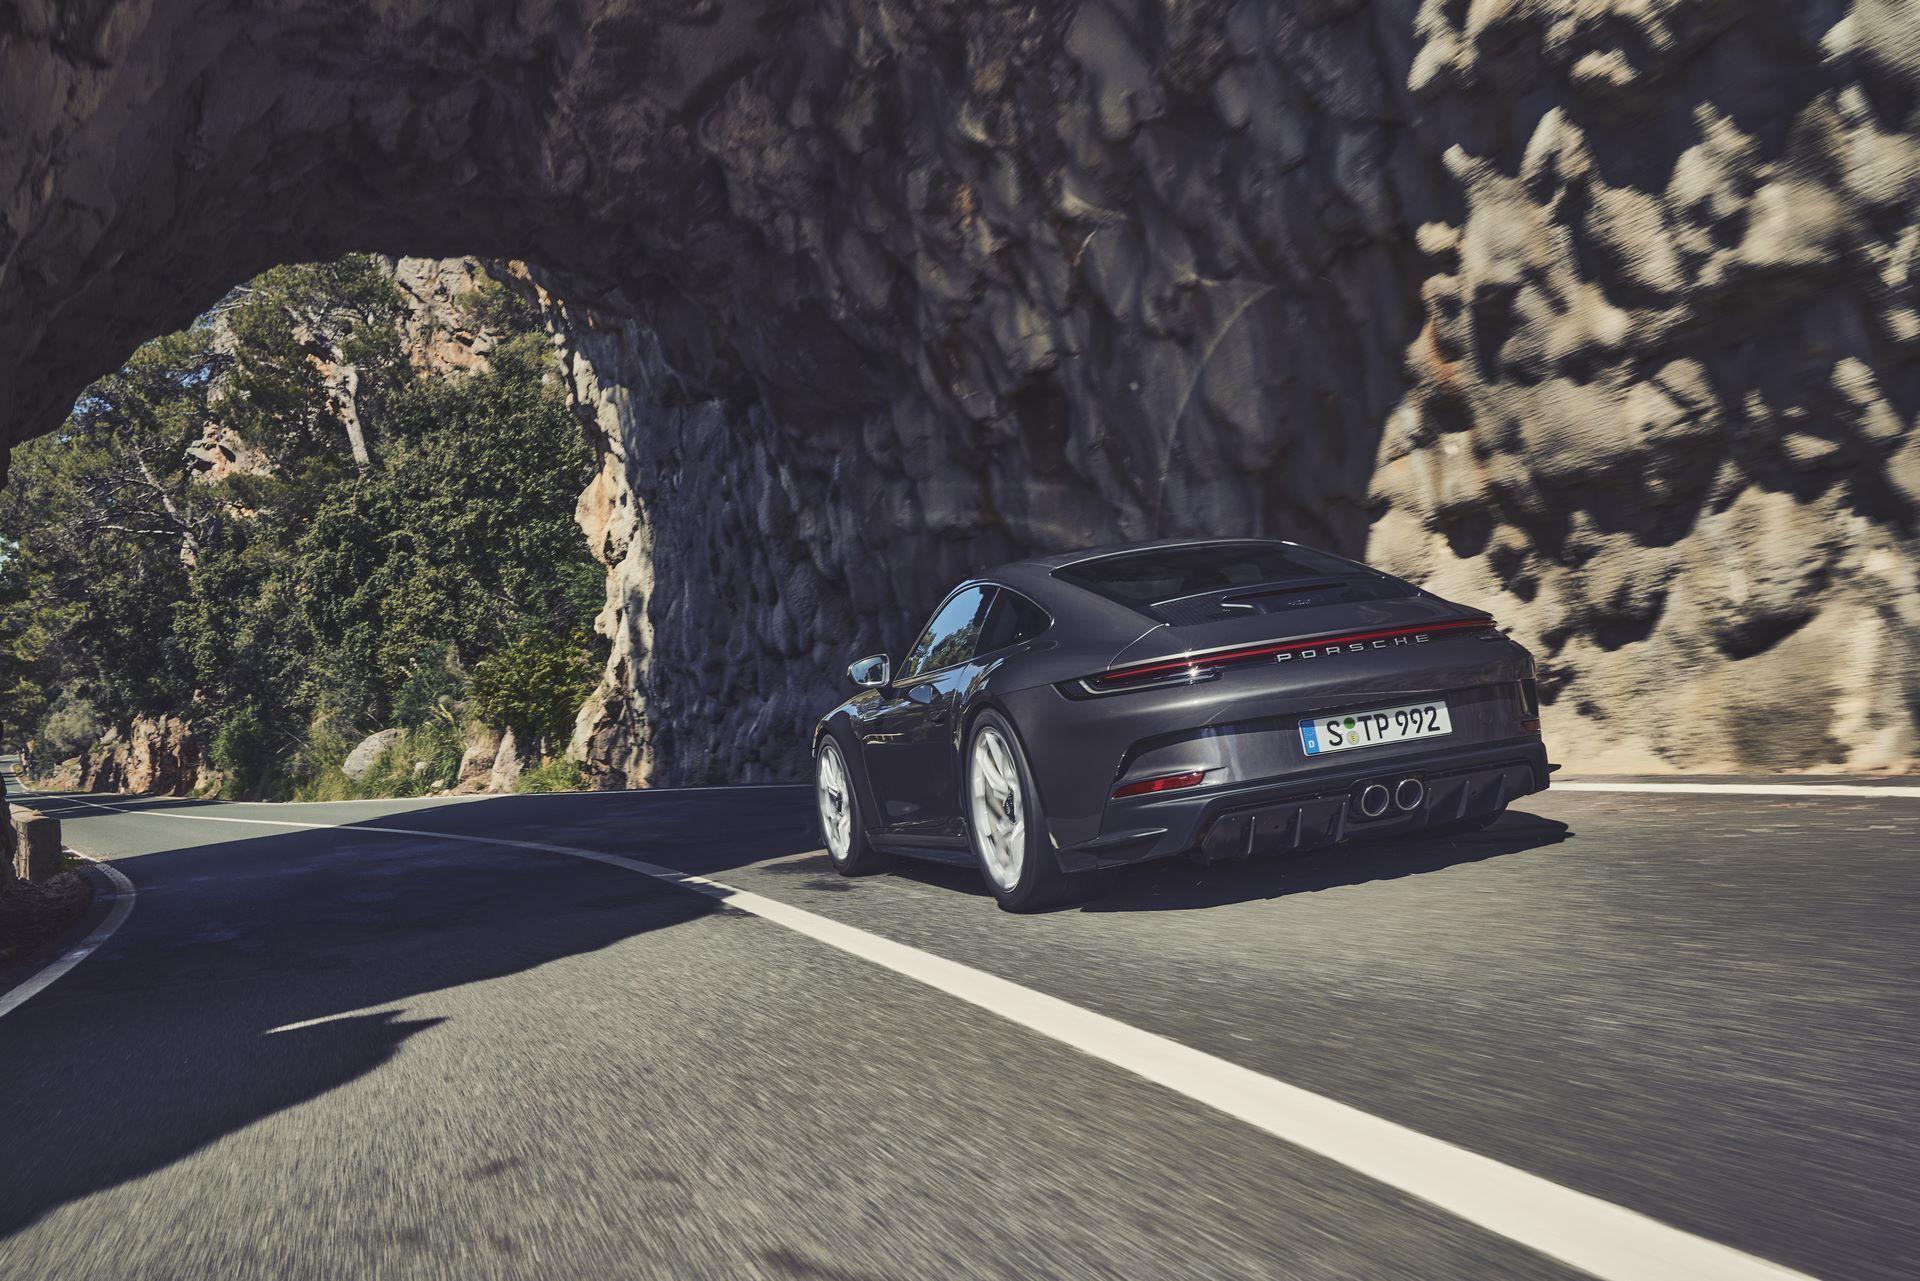 Porsche-911-GT3-Touring-Package-17